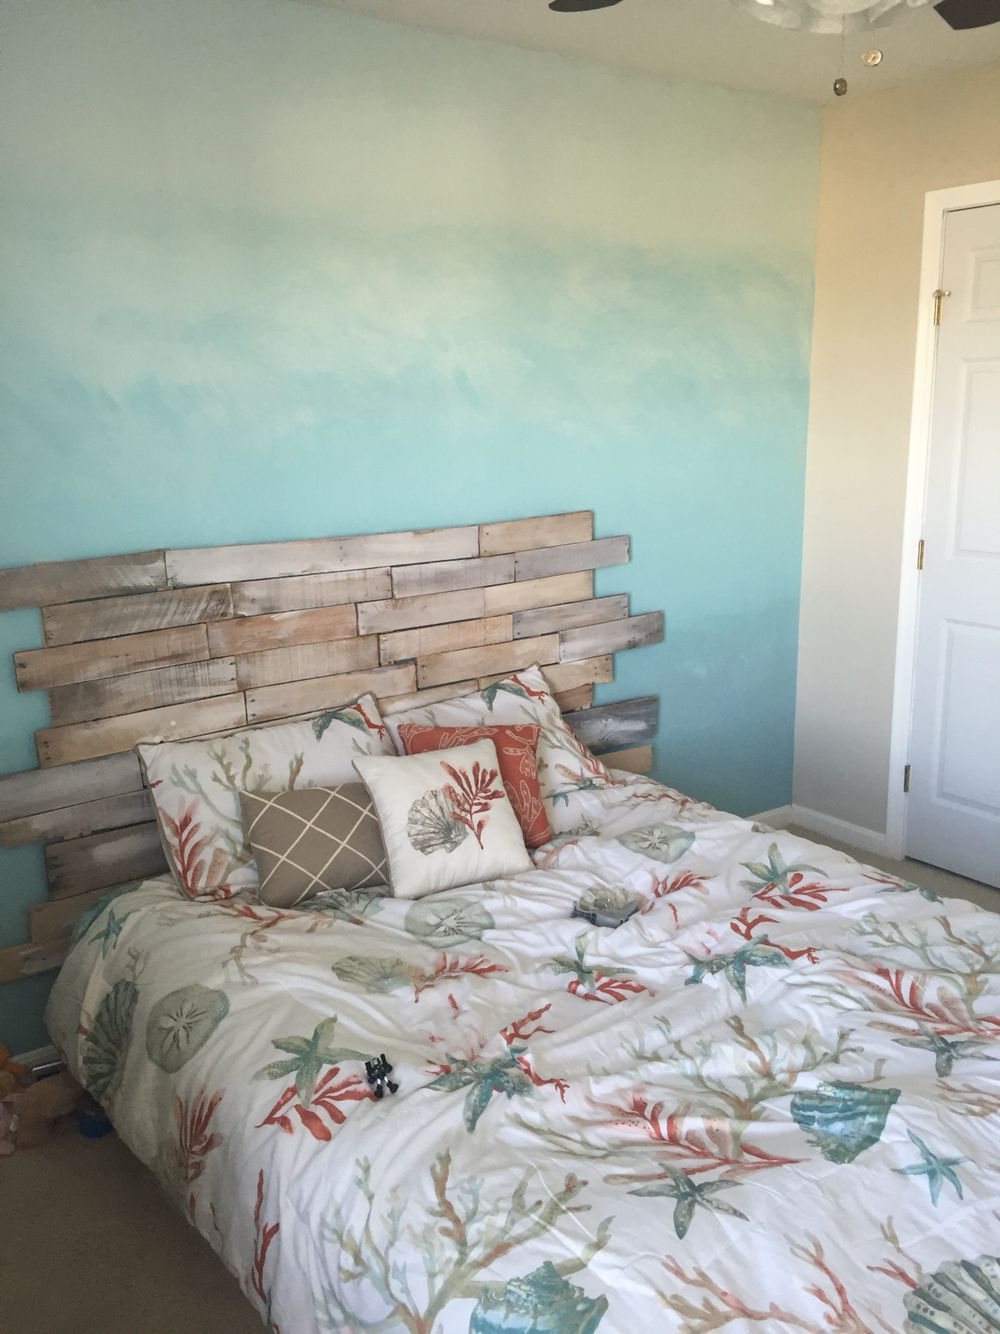 Ombre Ocean Wall Pallet Headboard For A Beach Themed Room Ocean Themed Bedroom Beach Themed Room Beach Themed Bedroom